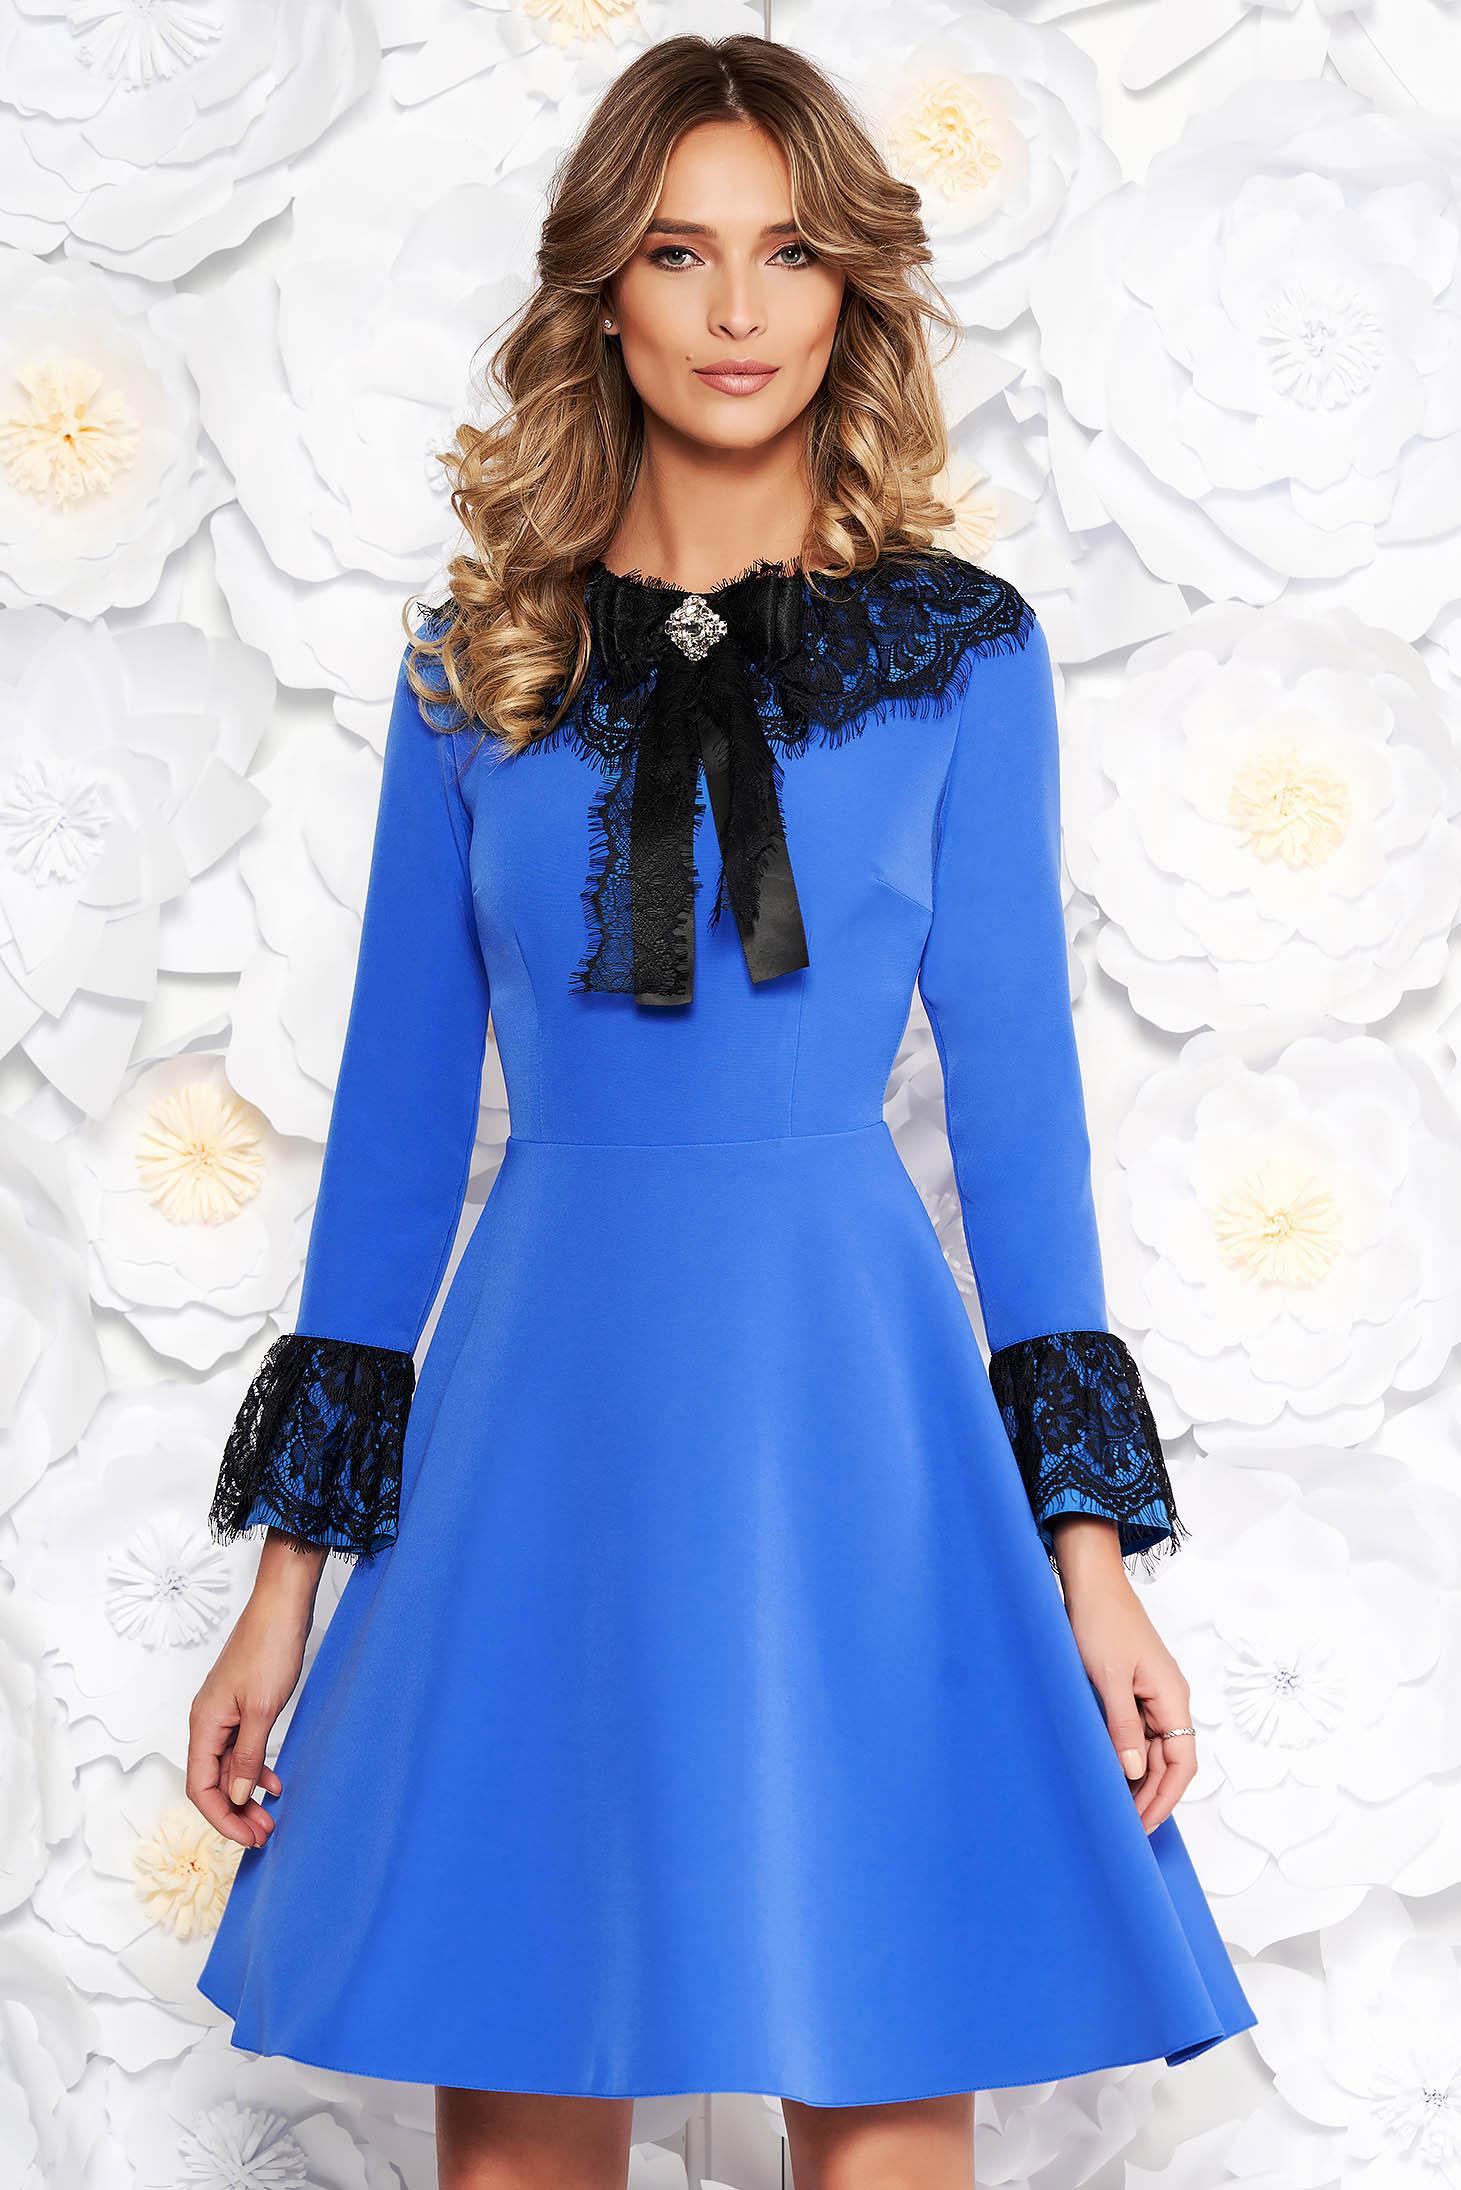 Rochie albastra eleganta in clos din stofa subtire usor elastica captusita pe interior cu aplicatii de dantela